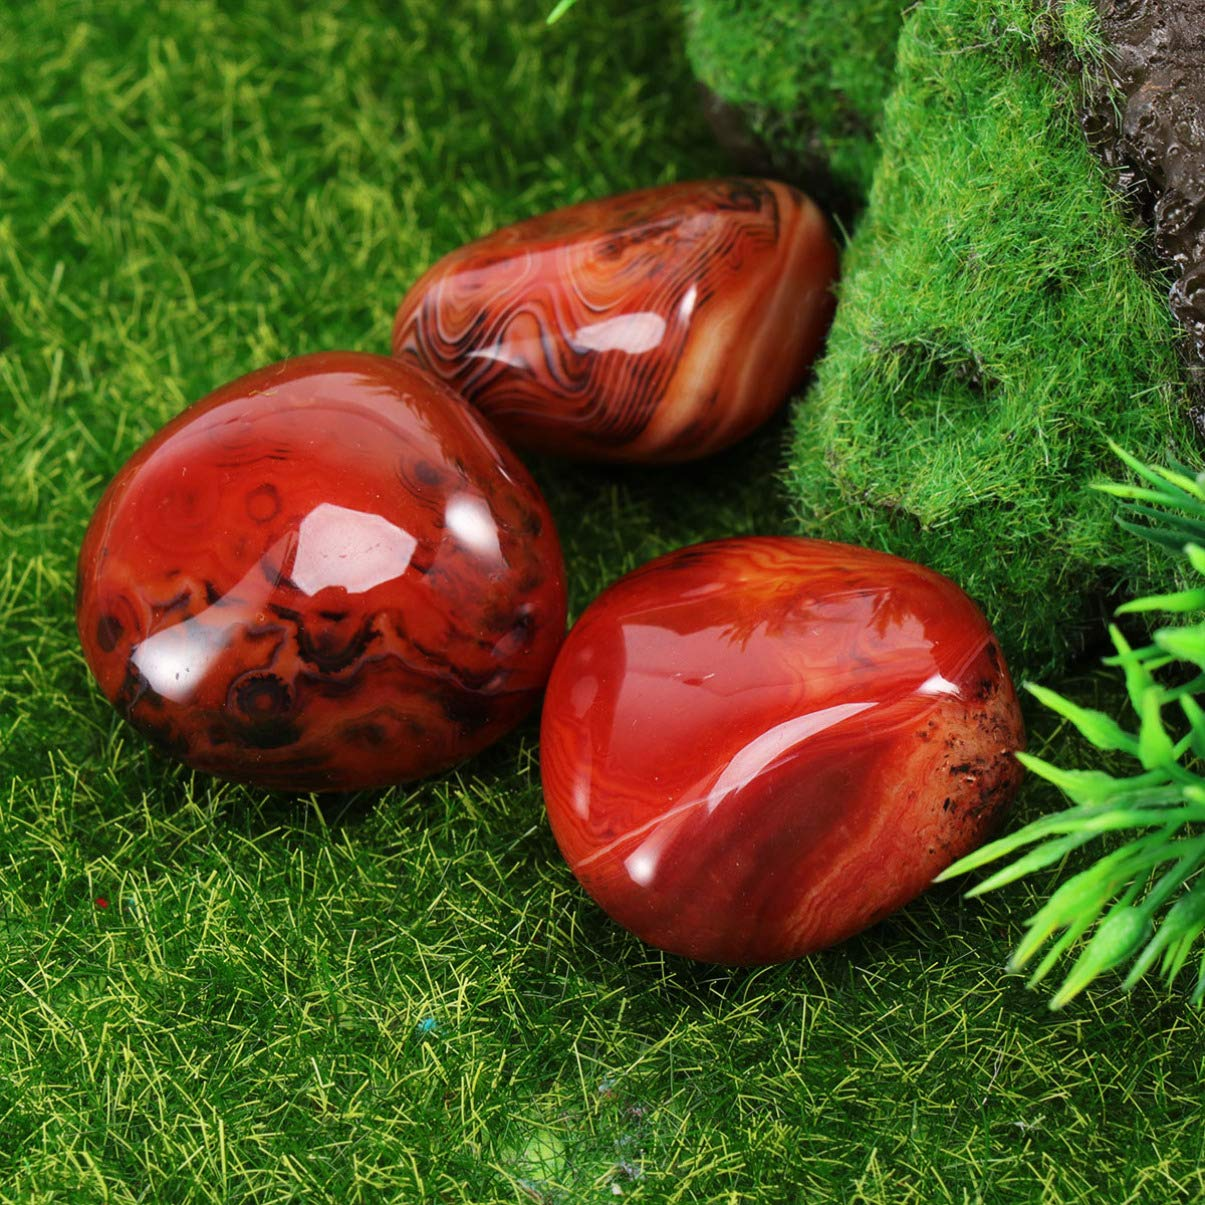 IMIKEYA Pietra Anticata Agata 3pc Pietra curativa Naturale di Agata sardonica Pietra di Palma Irregolare Reiki Ghiaia sardonicax per guarigione di fontane Artigianali Circa 2-3 cm